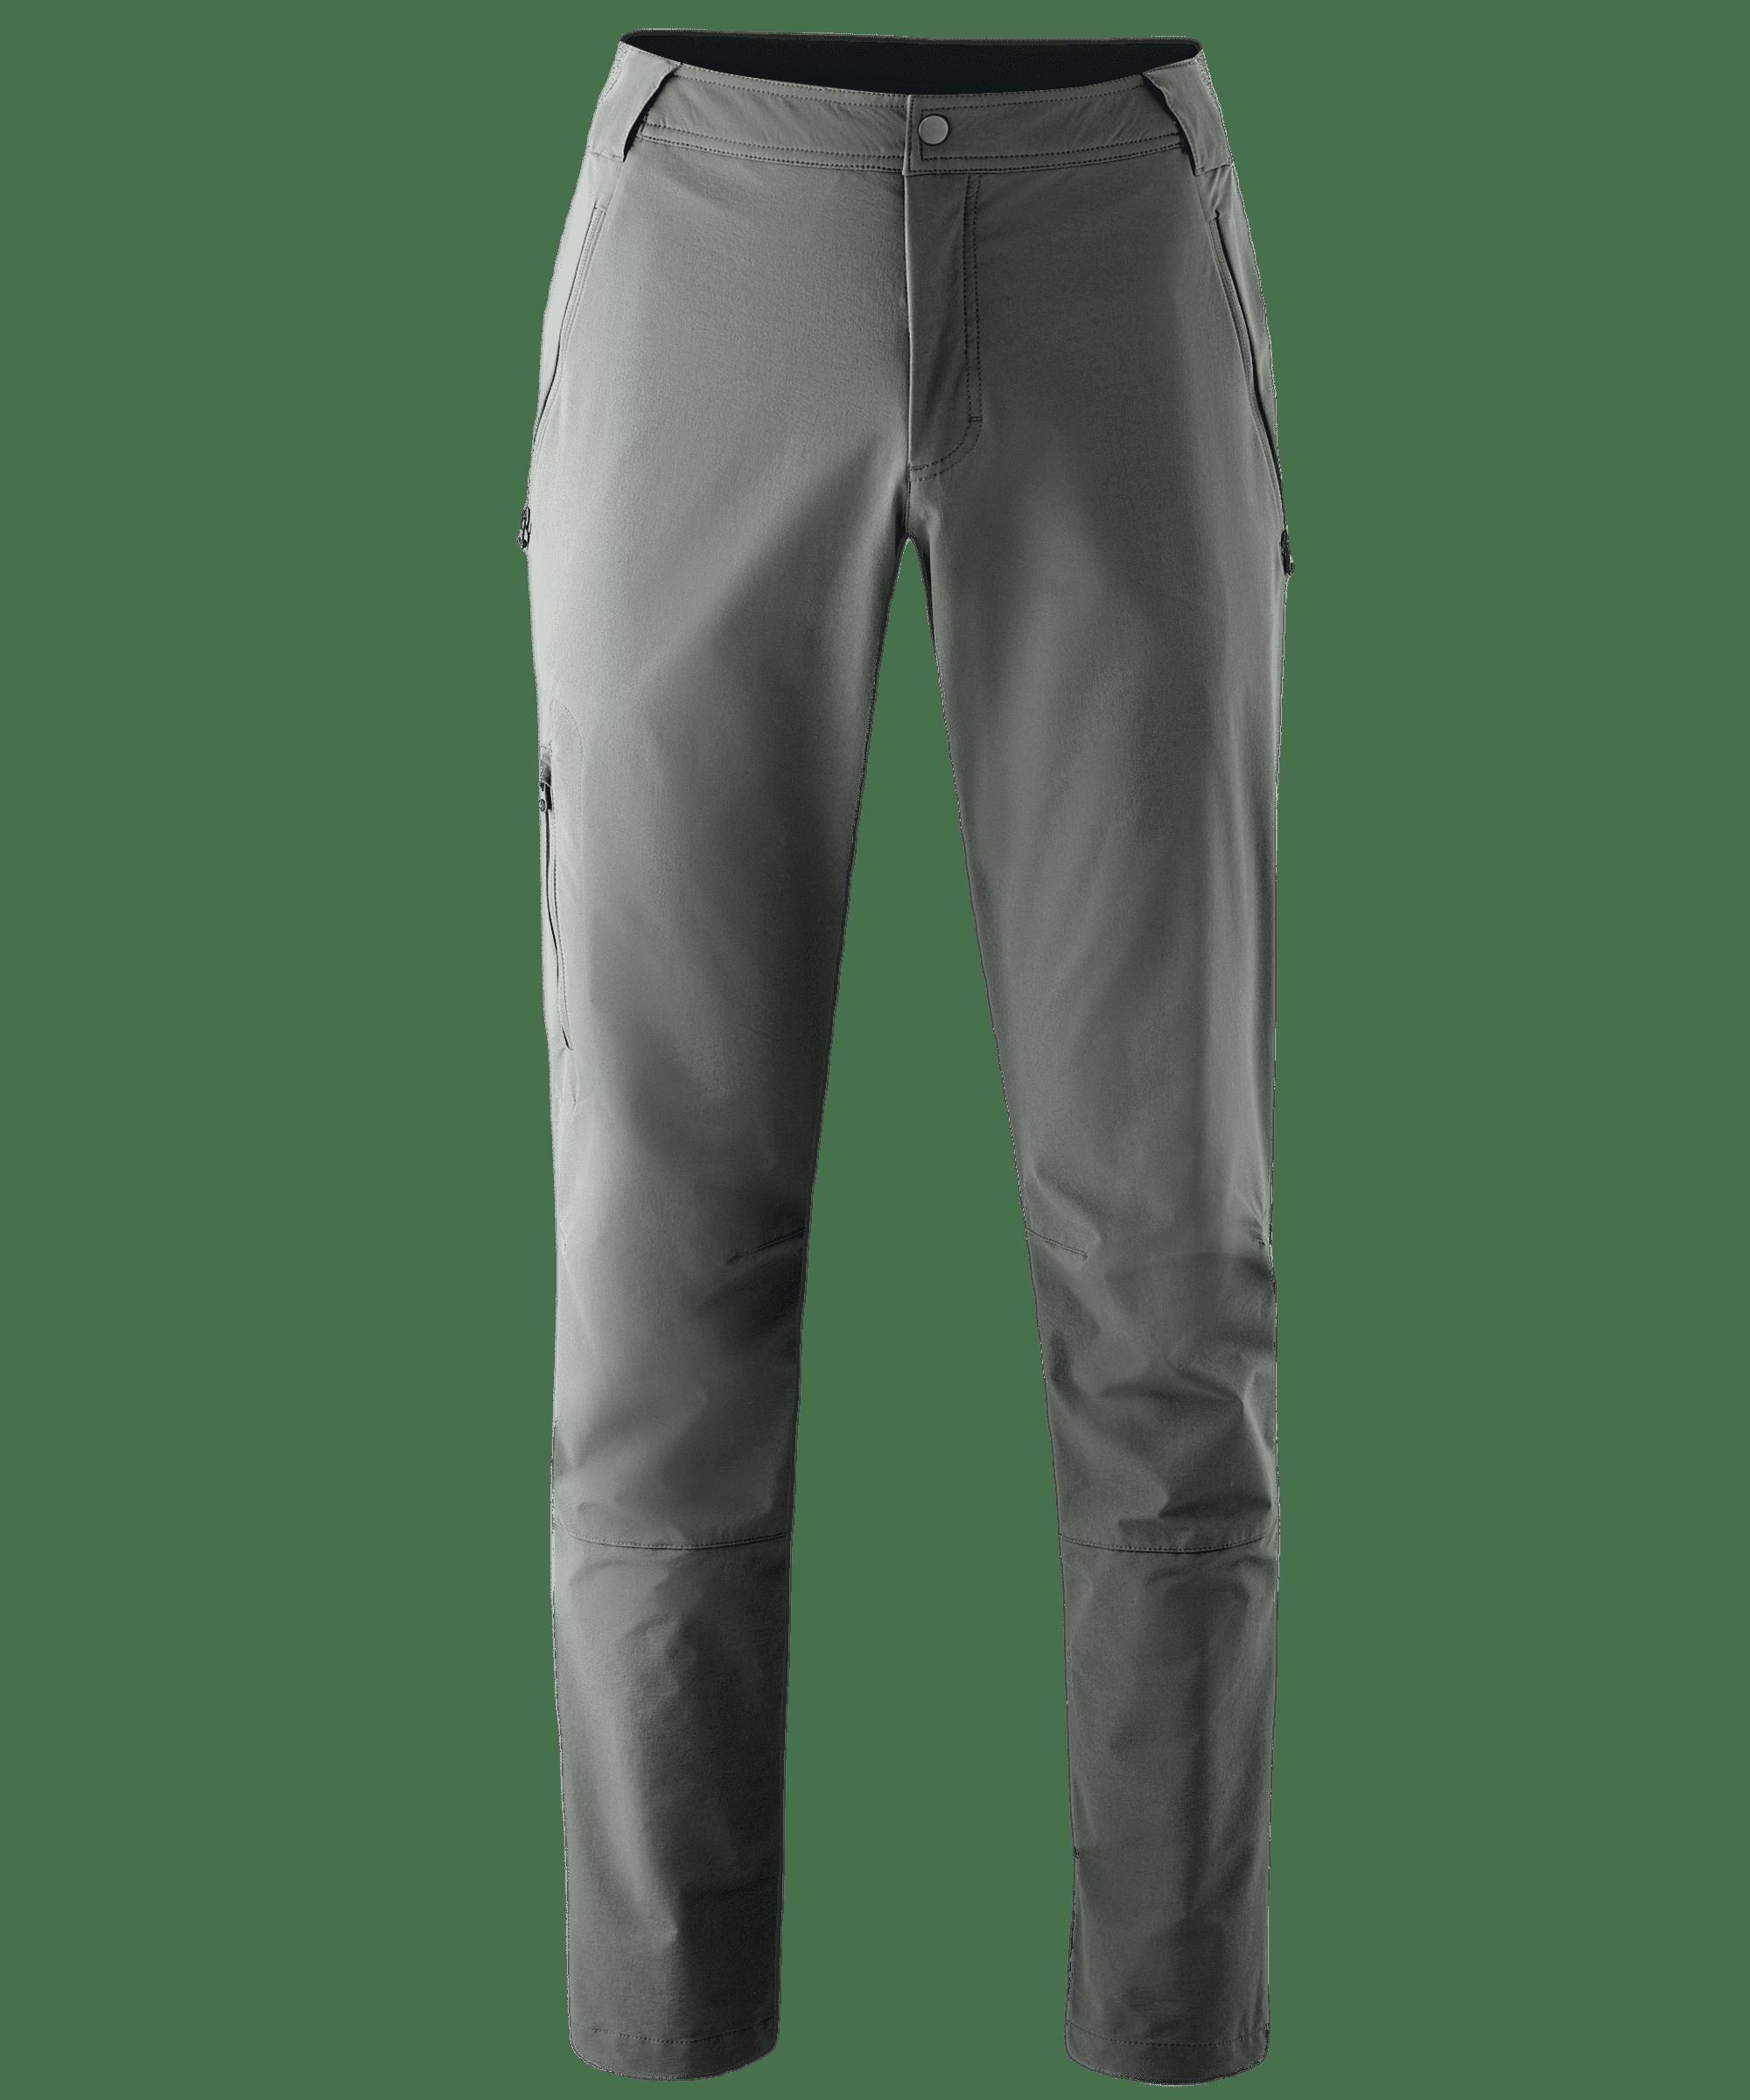 Norit 2.0 lange broek